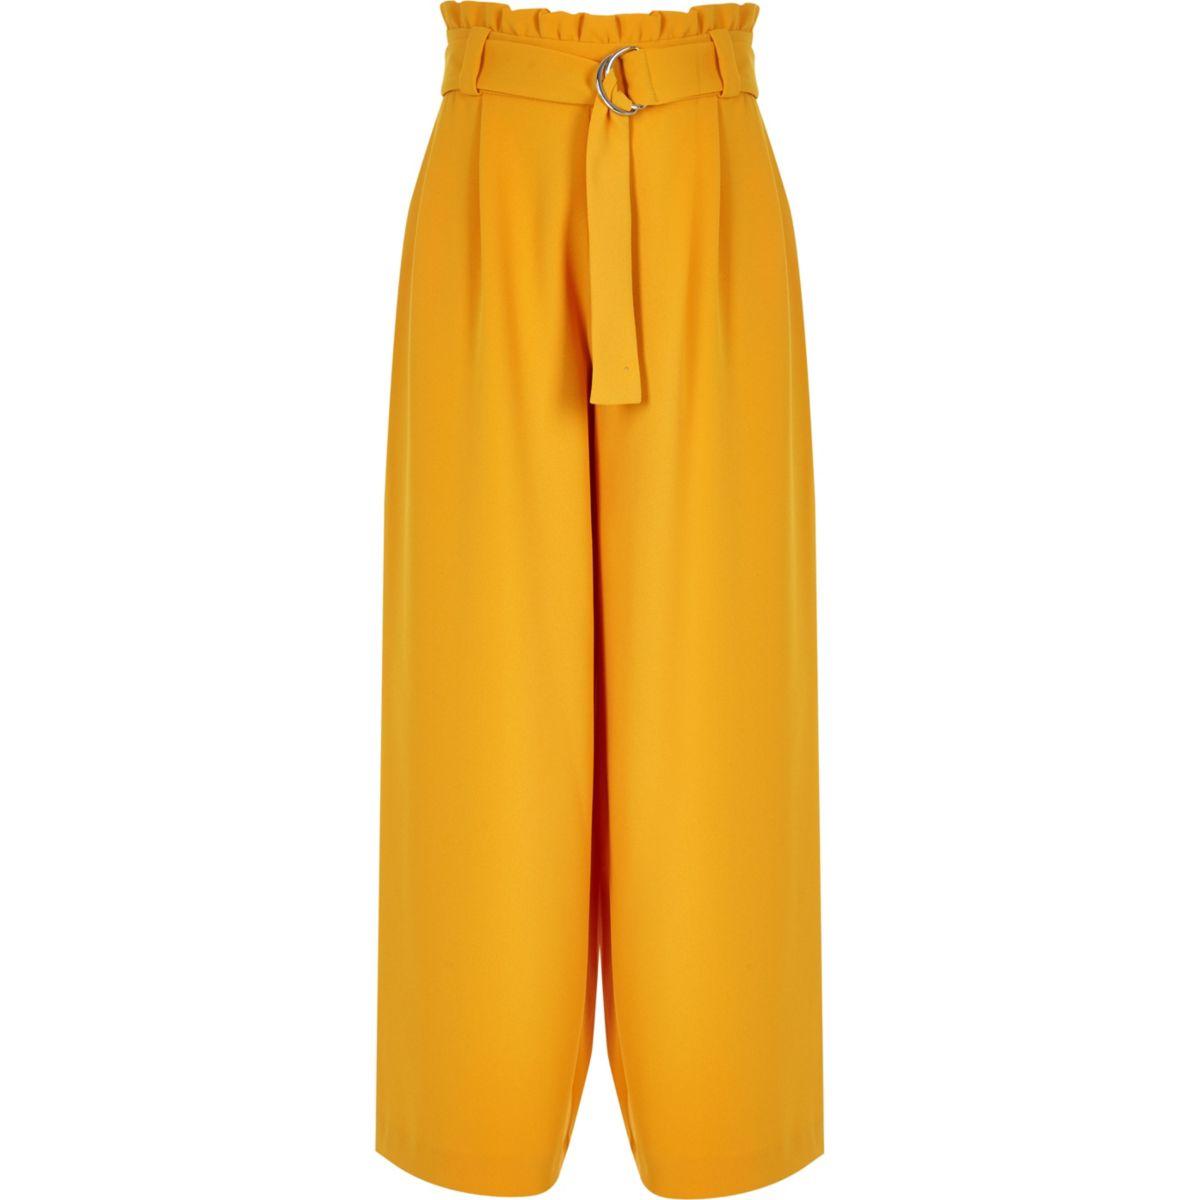 Girls yellow paperbag waist wide leg pants